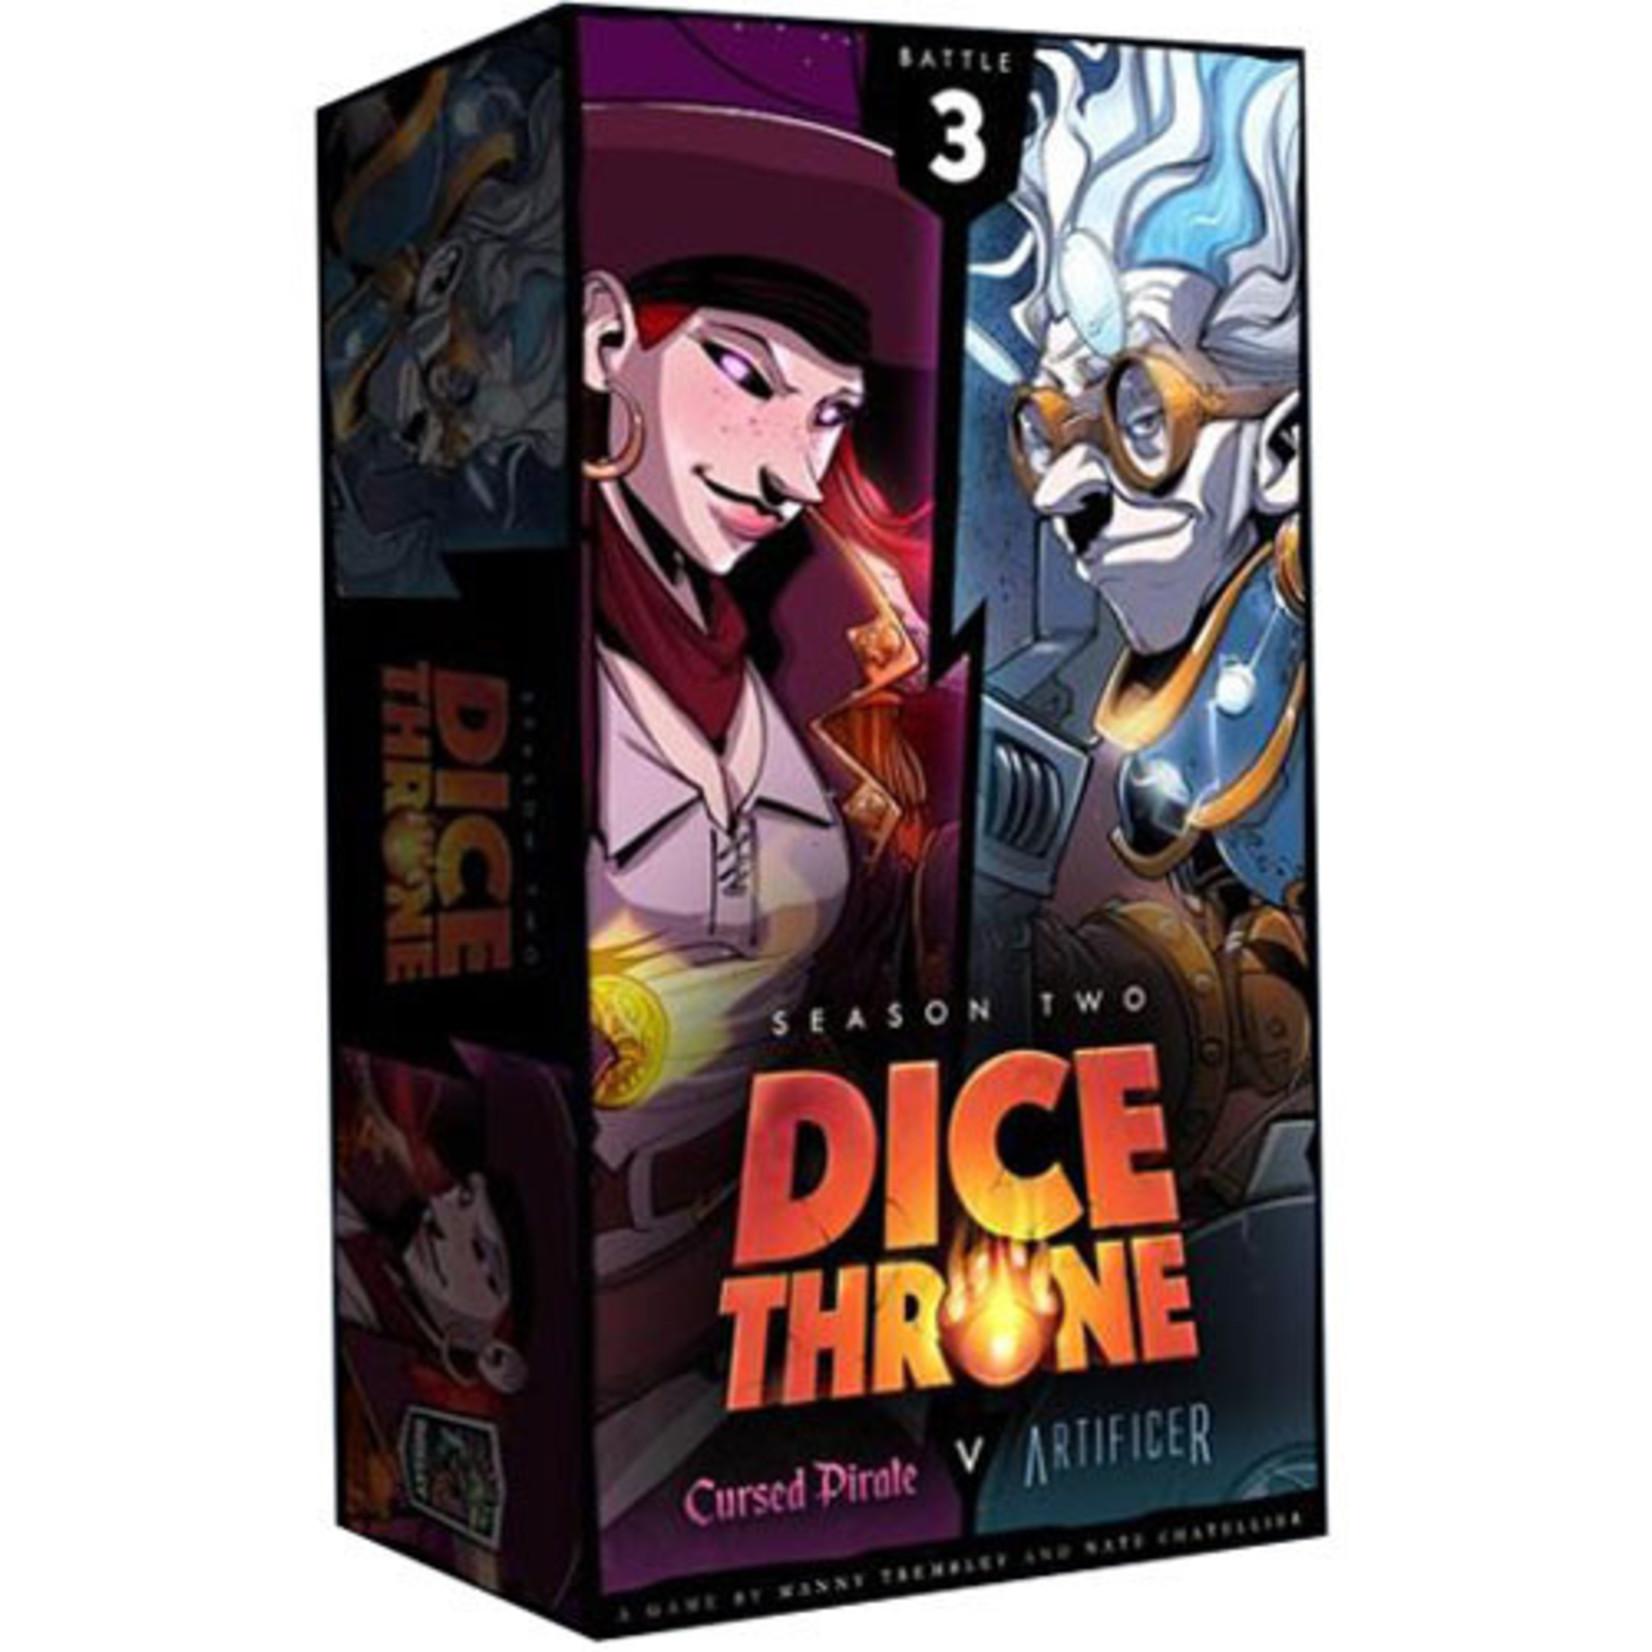 Dice Throne: Season 2 - Box 3 - Cursed Pirate vs Artificer